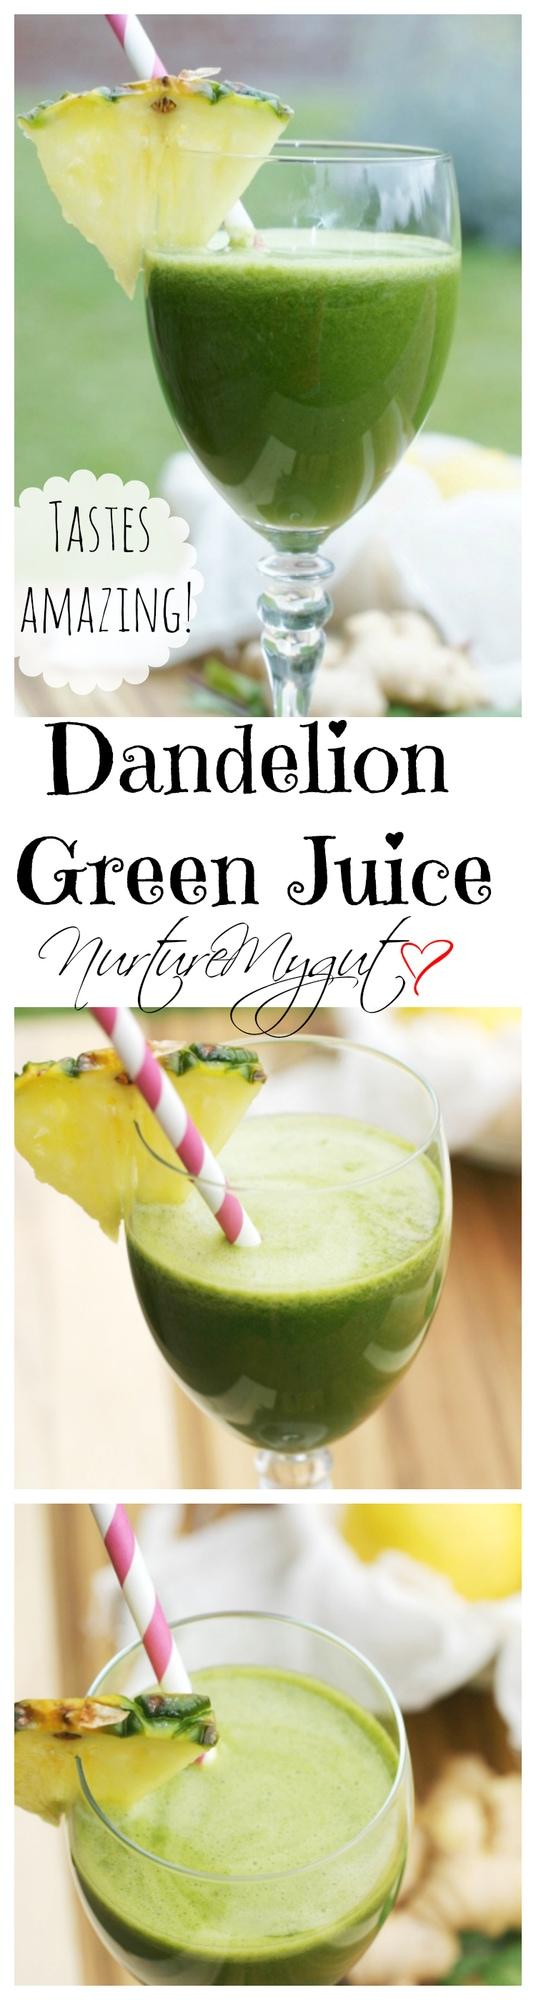 Dandelion juice malvernweather Gallery